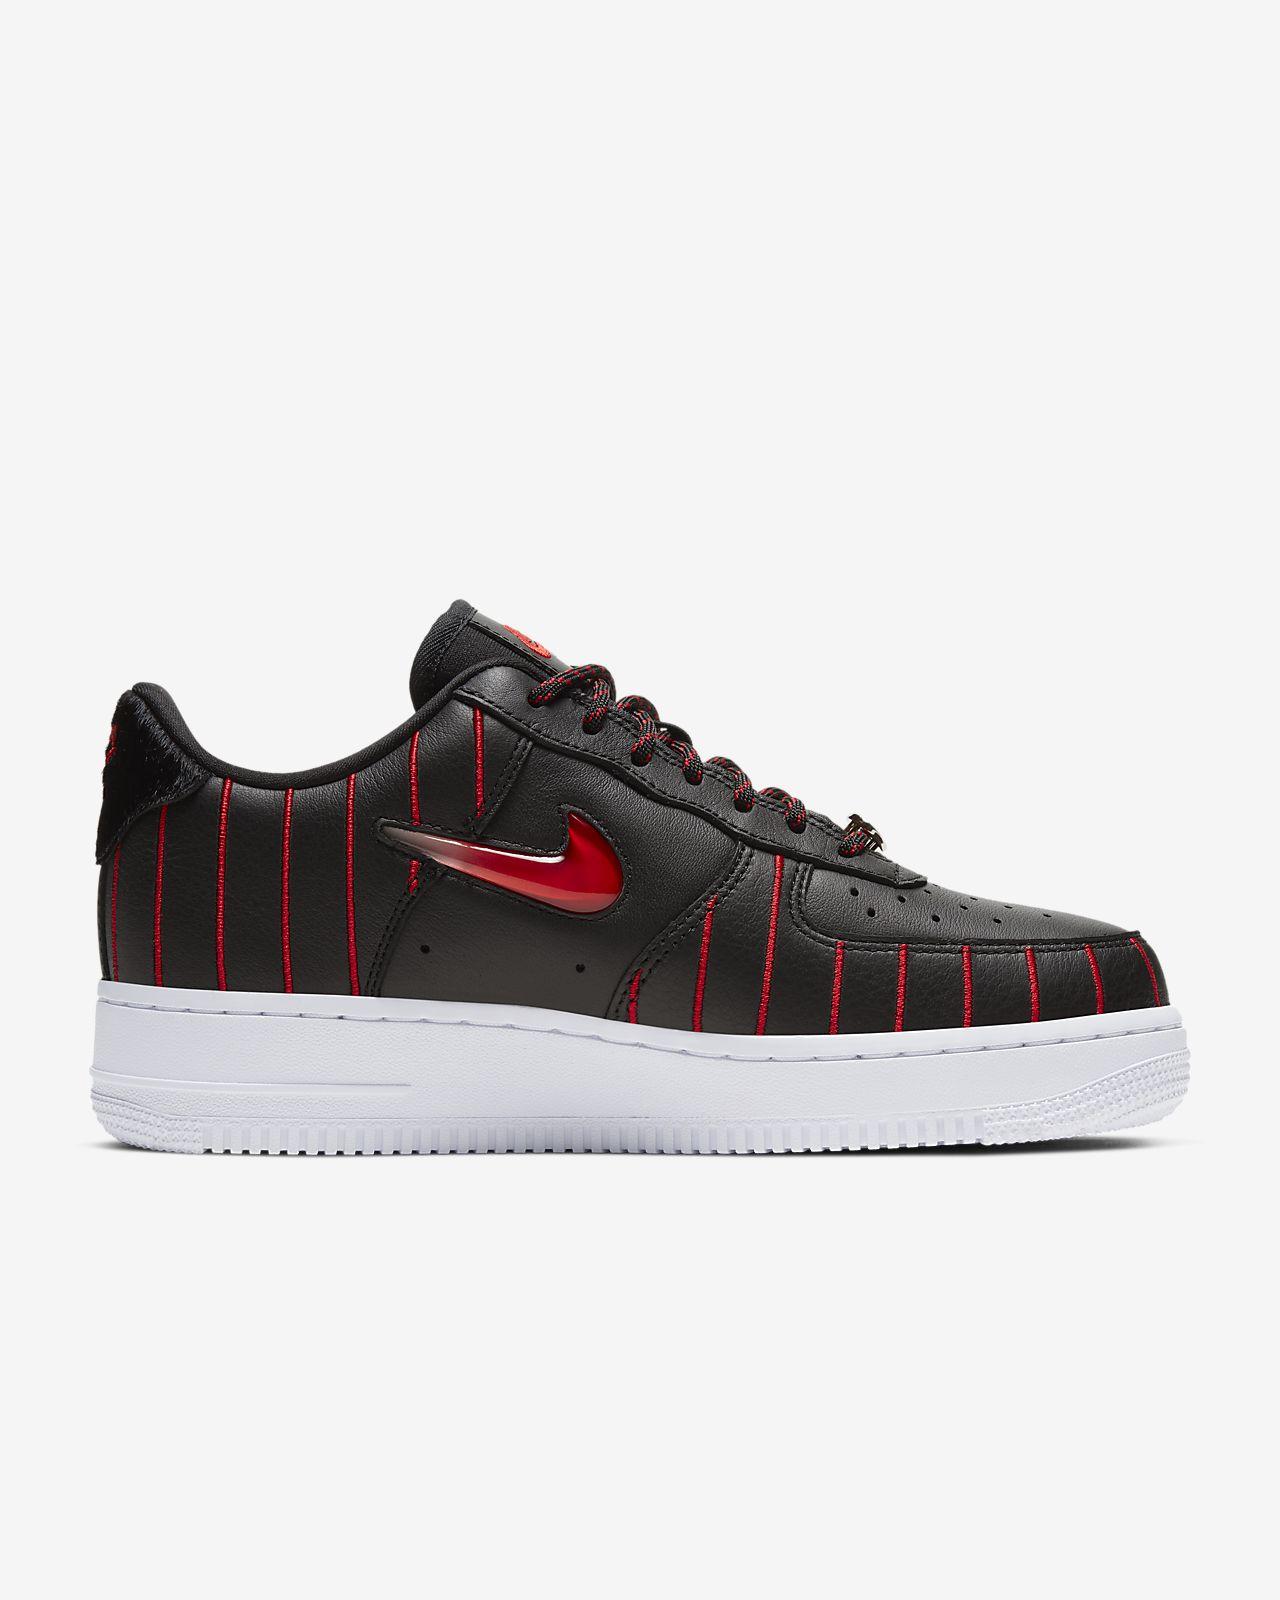 Nike Air Force 1 Jewel Schuh